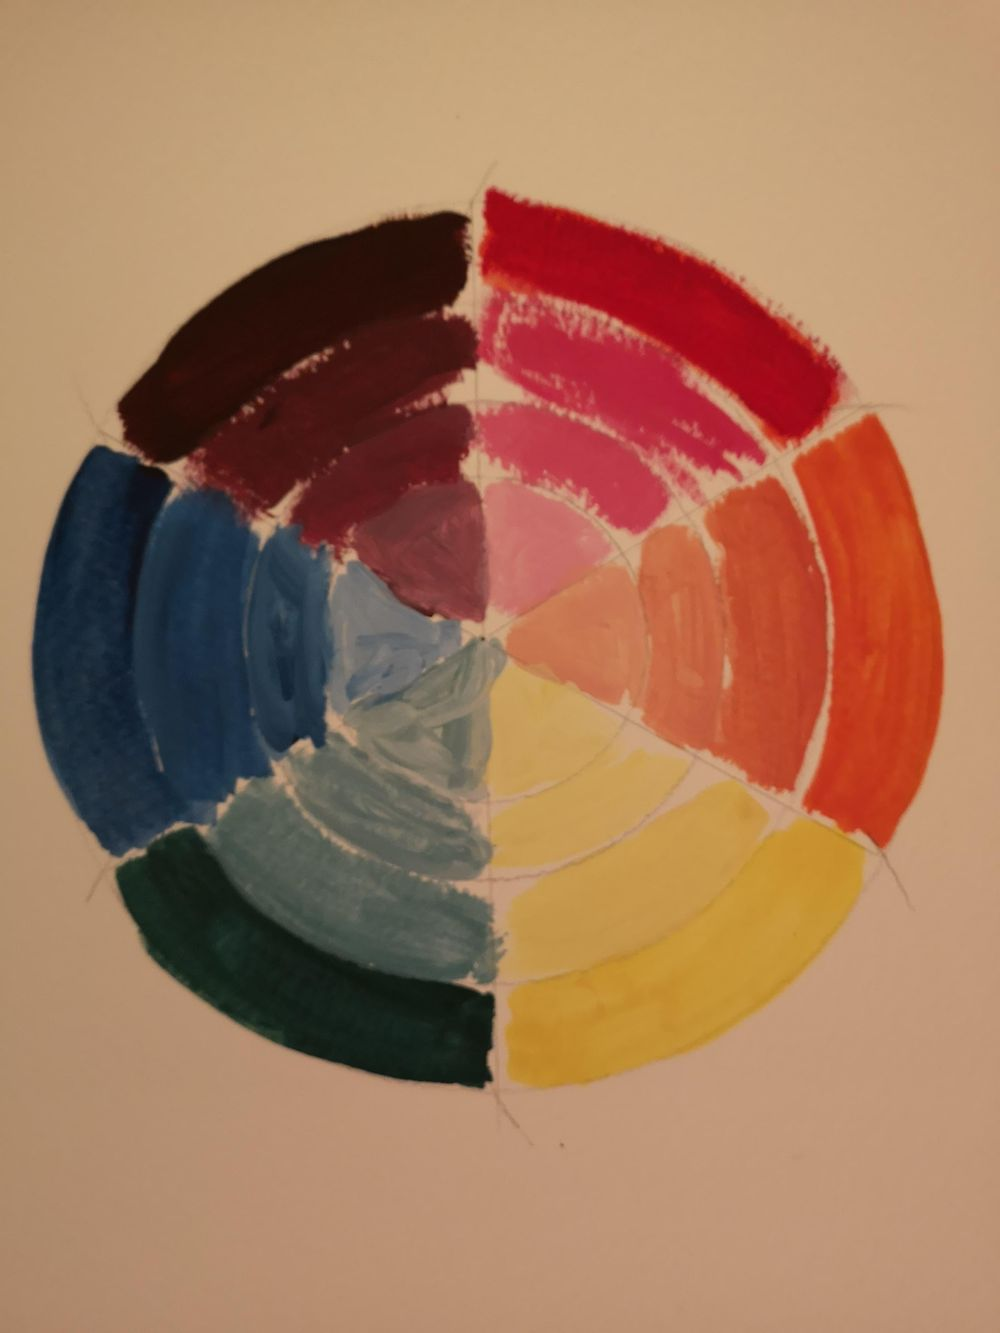 Osnove olje/akril - image 2 - student project